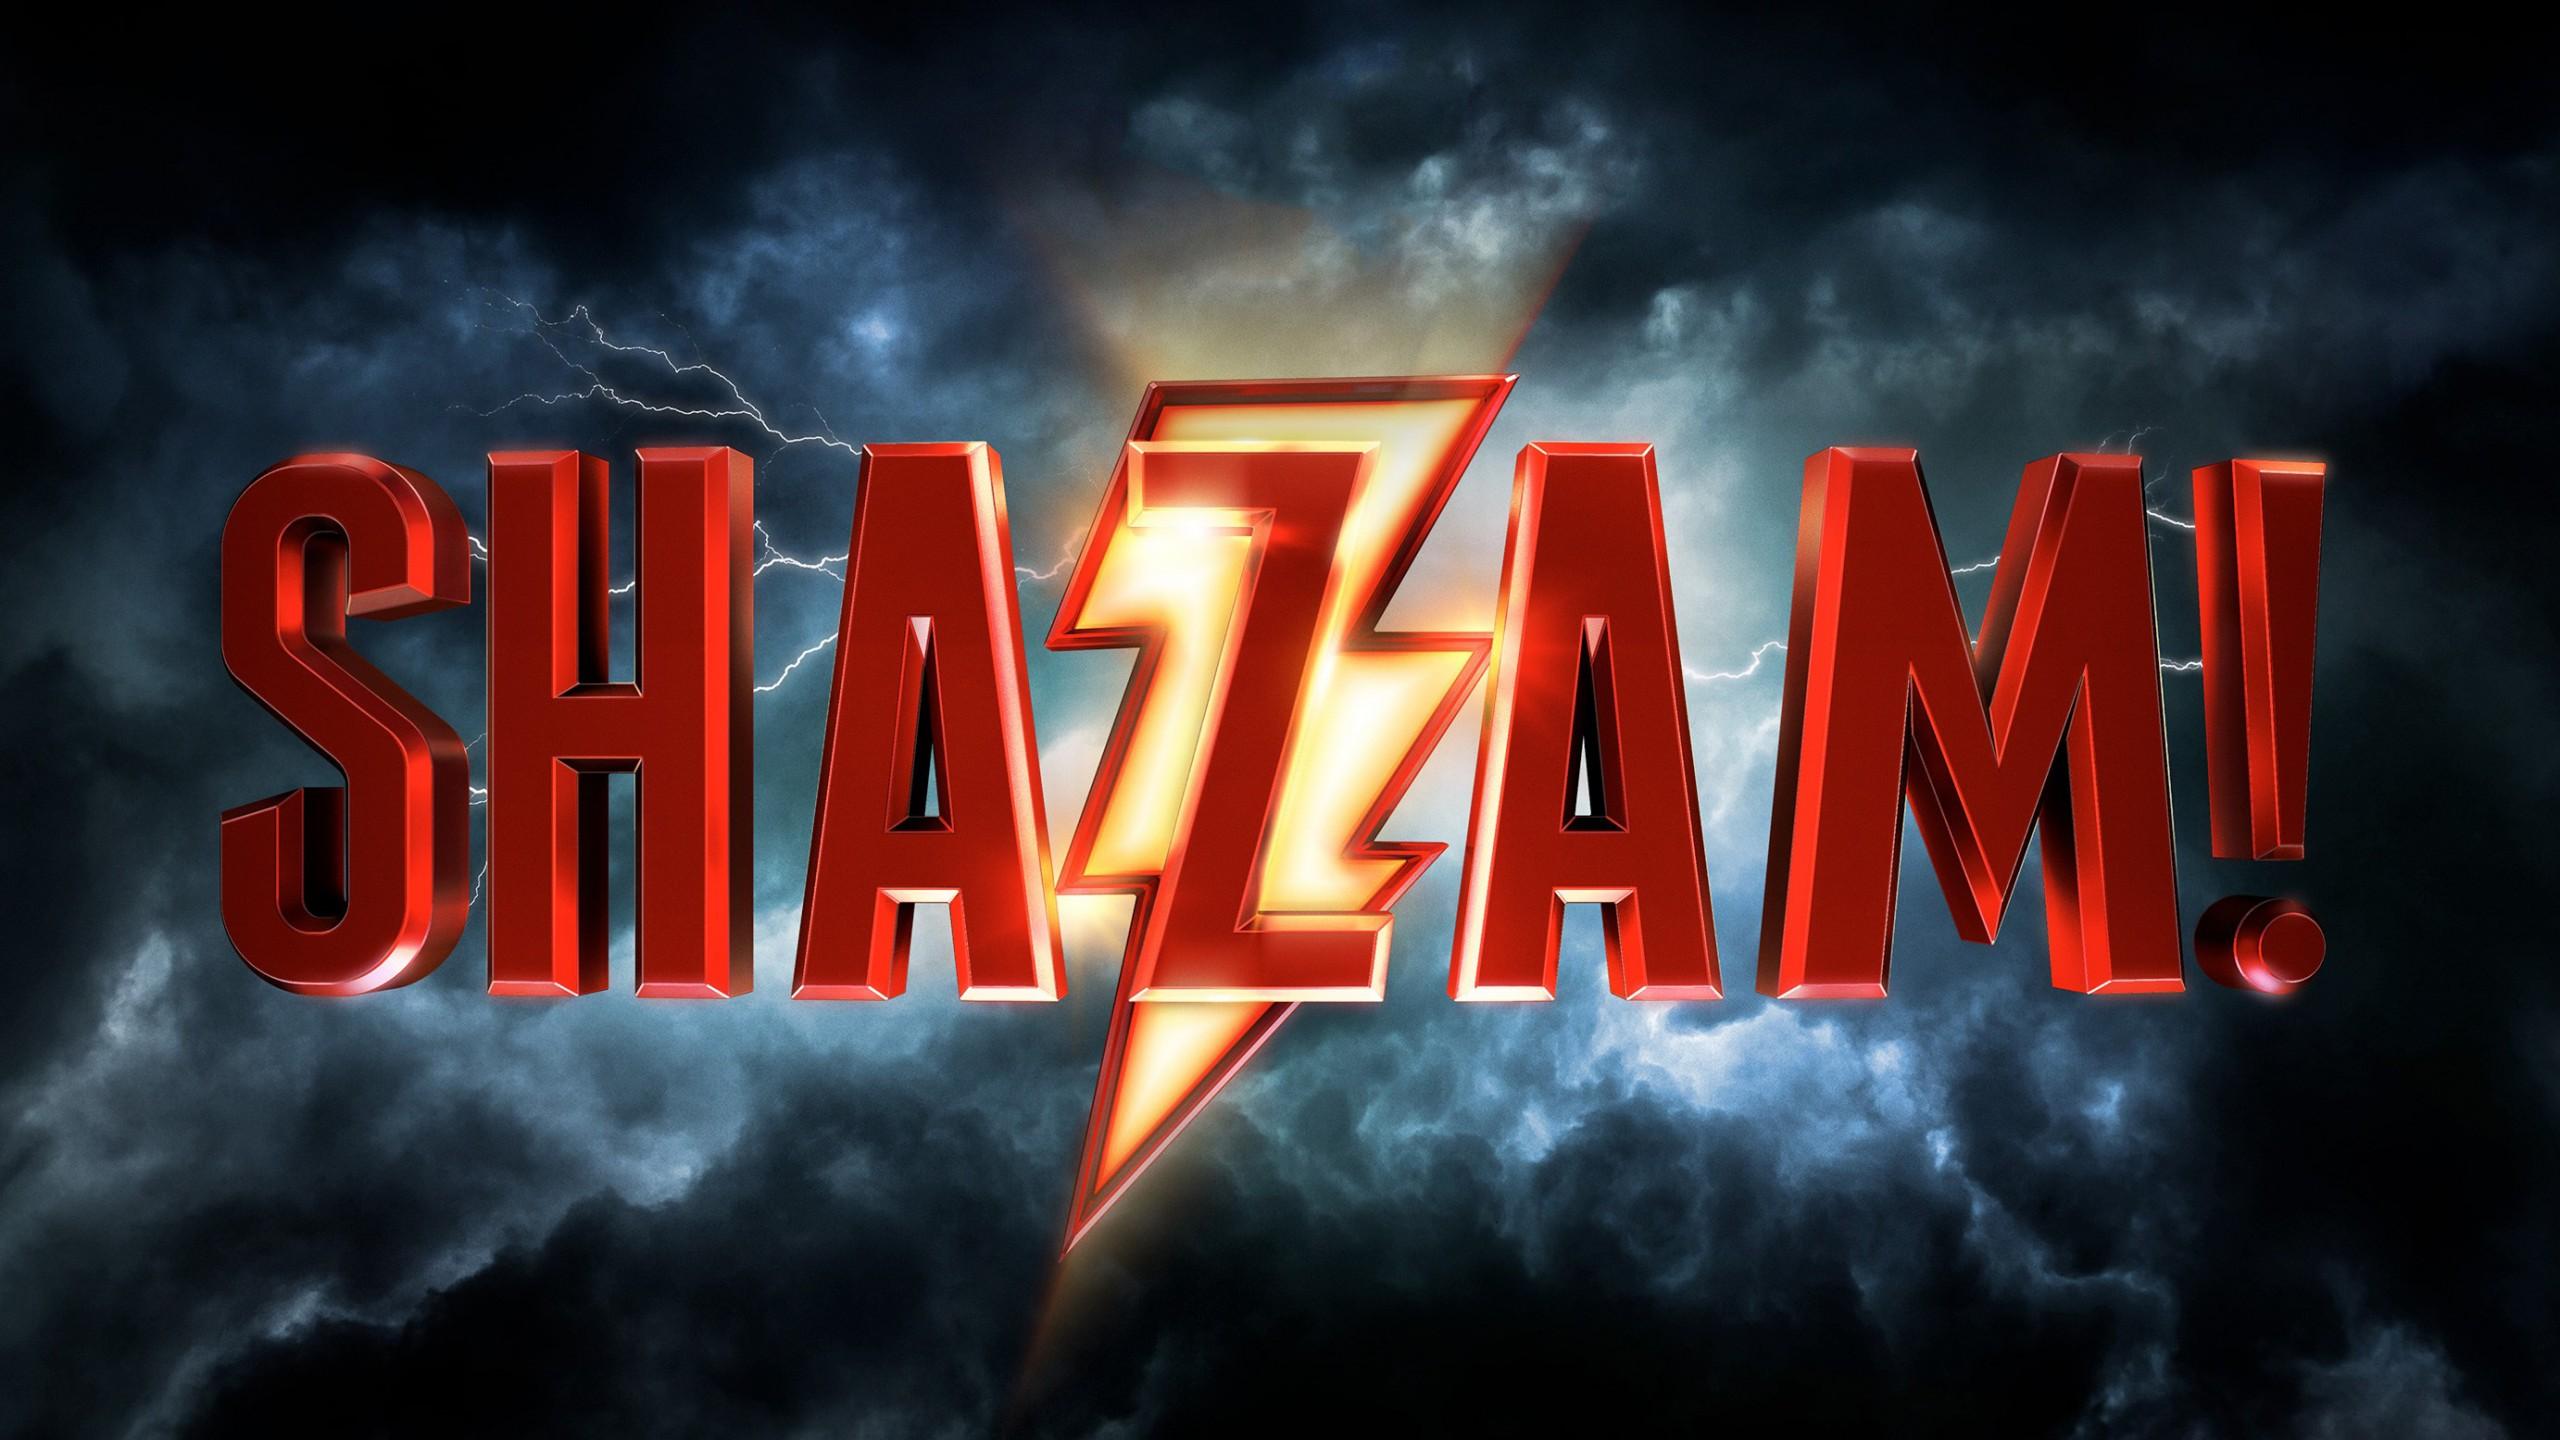 Wallpaper Shazam Hd Movies 20629